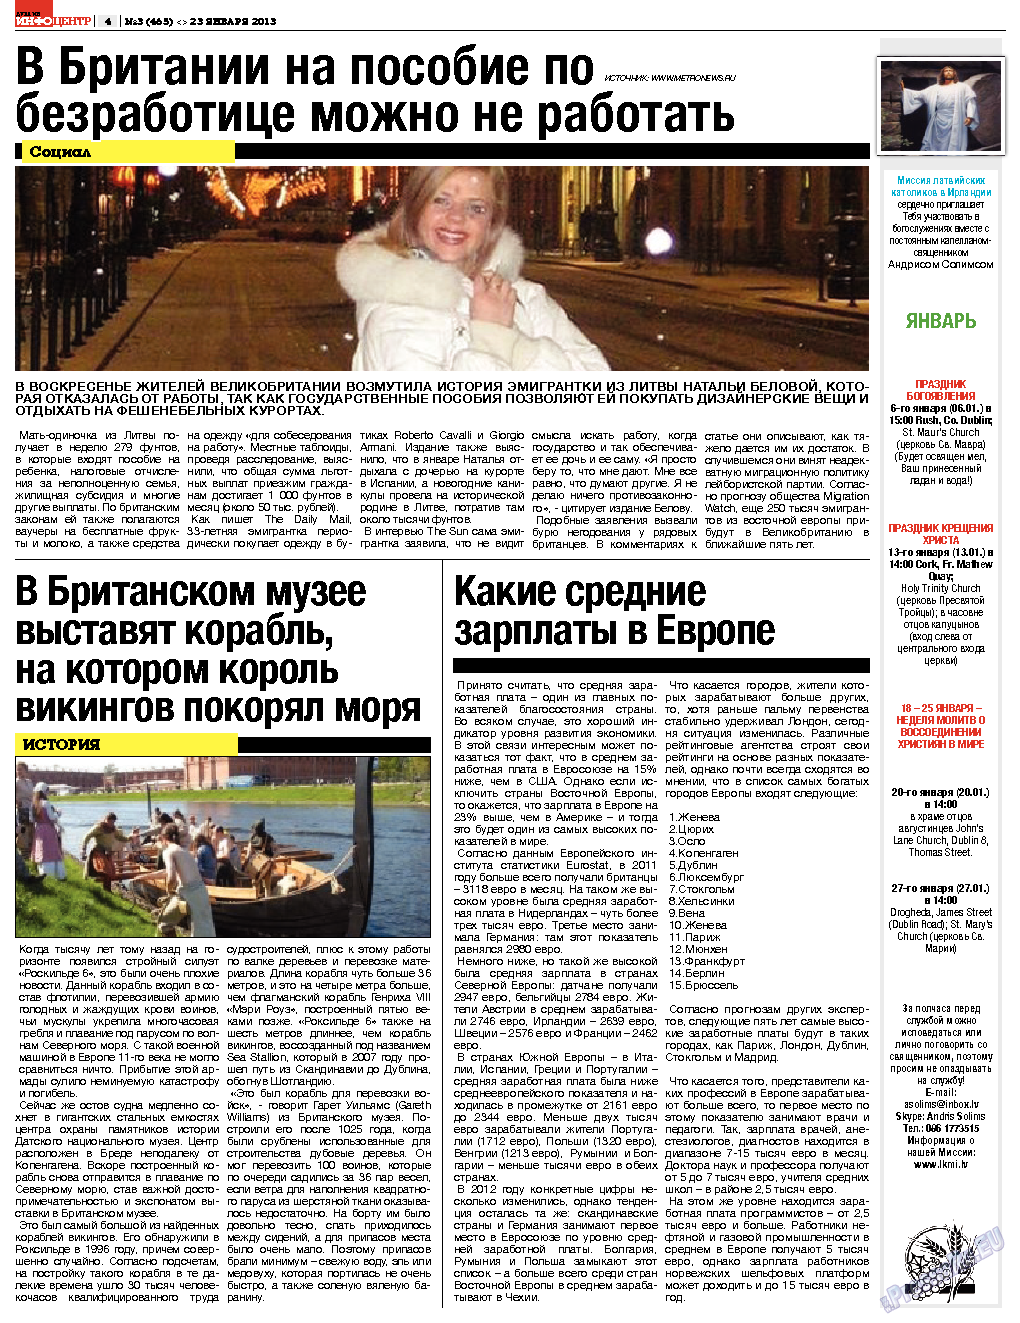 Дублин инфоцентр (газета). 2013 год, номер 3, стр. 4